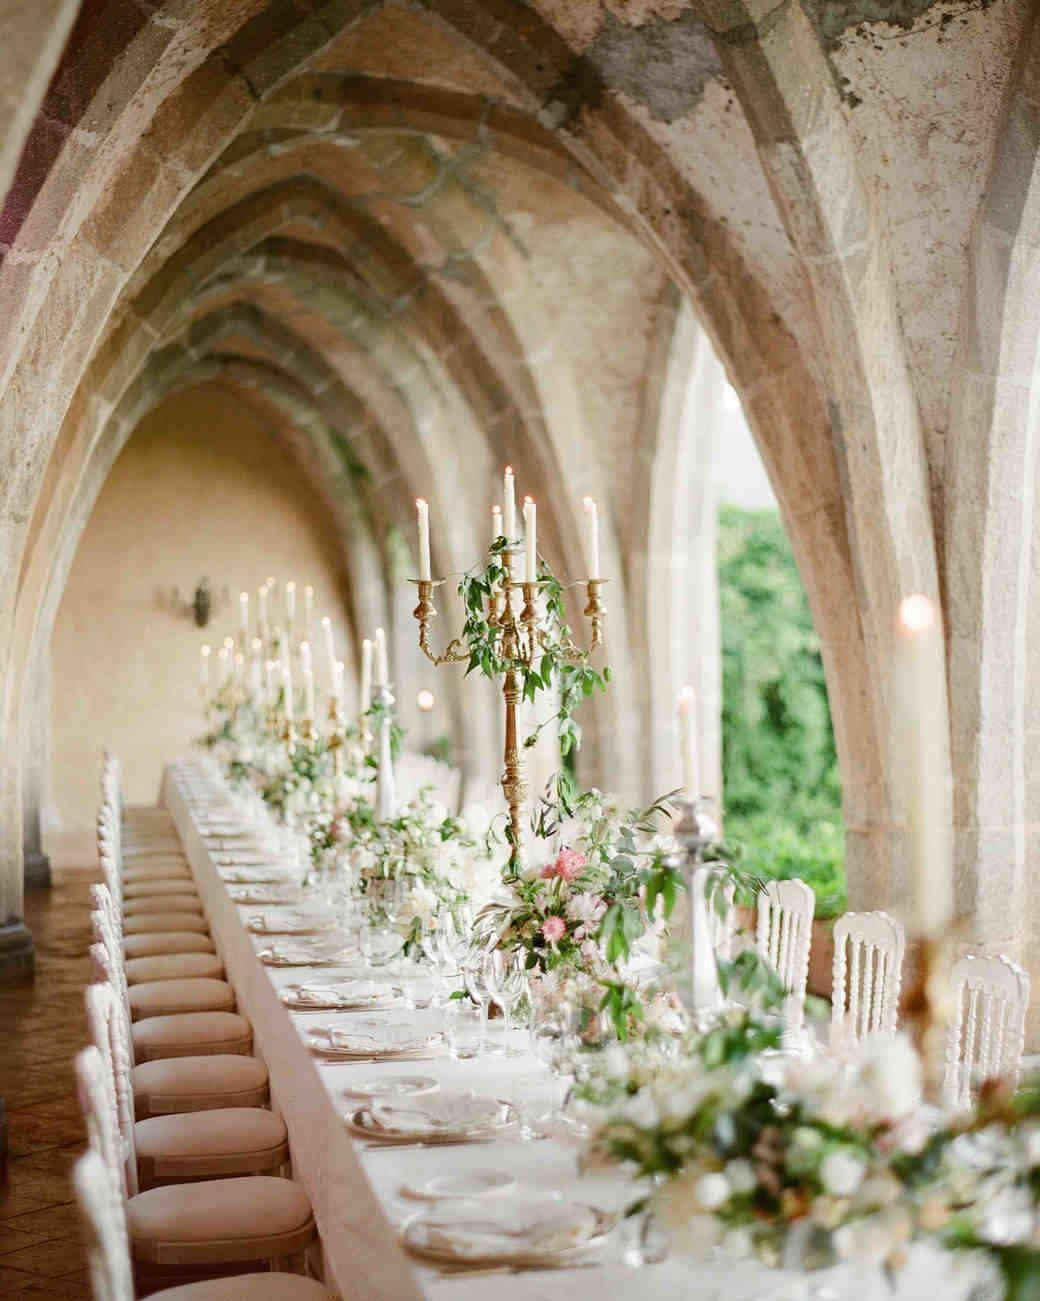 lisa-greg-italy-wedding-table-103312971_vert.jpg